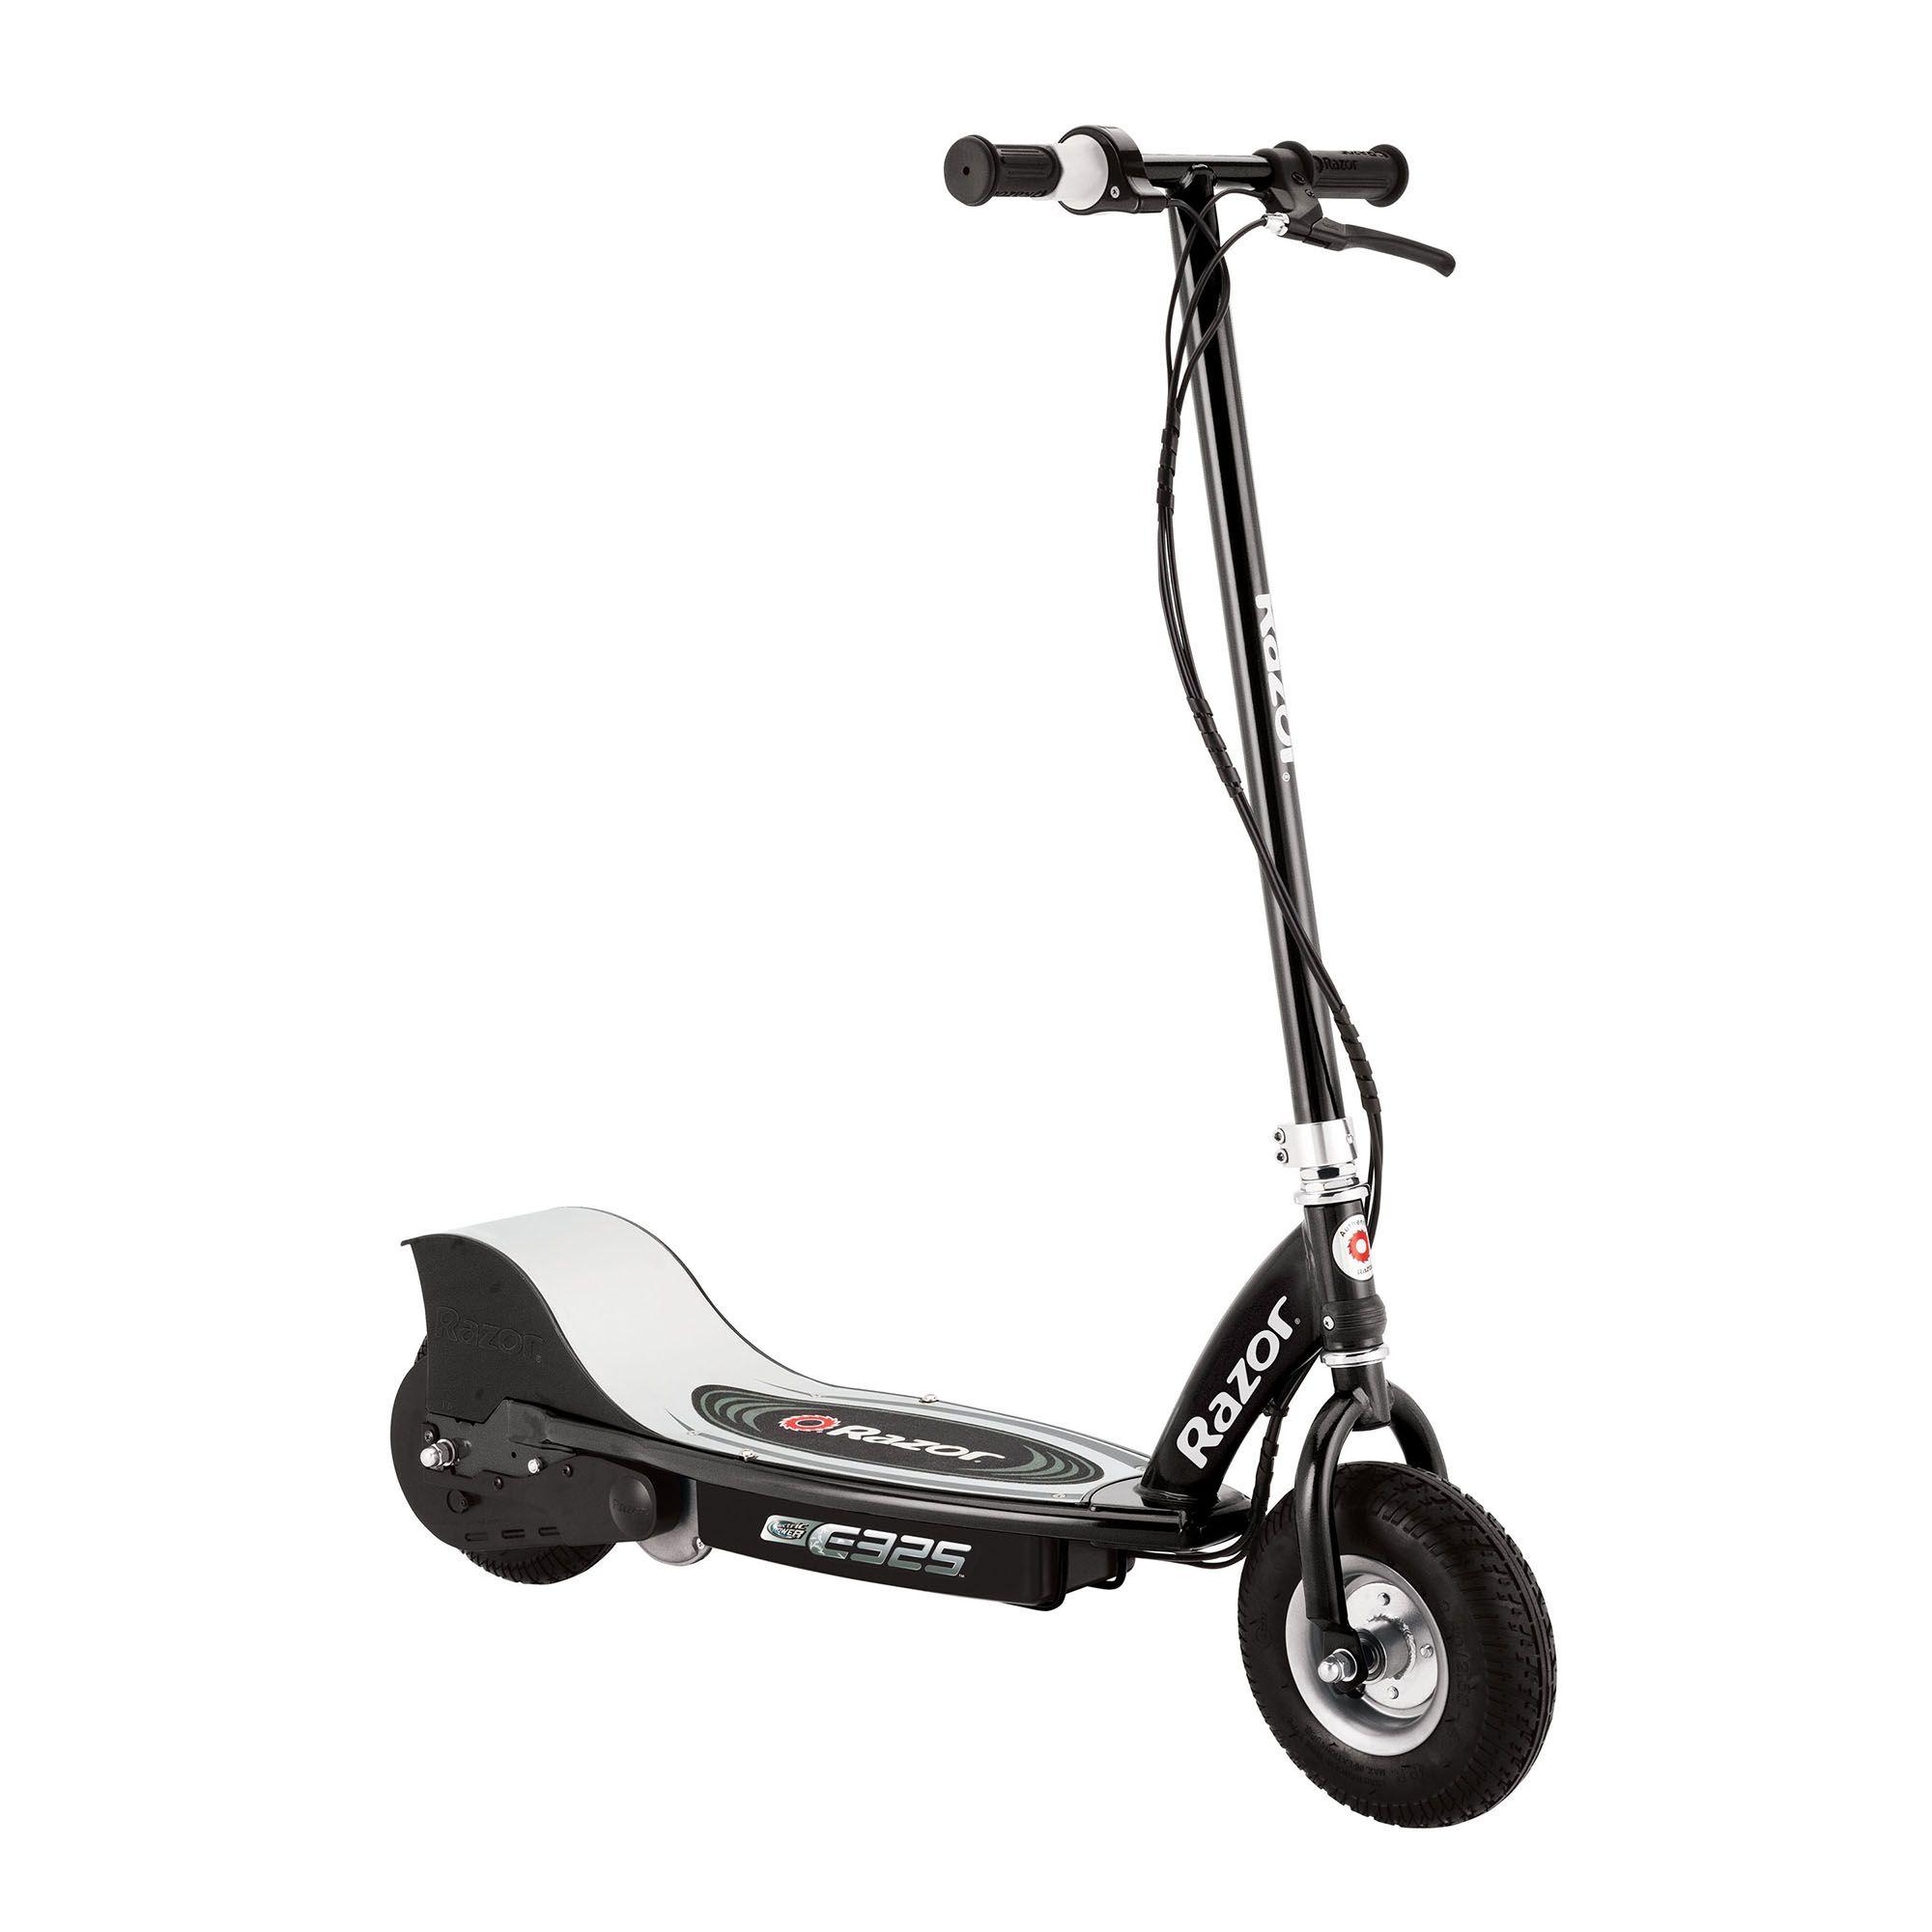 Razor electric scooter e125 best price